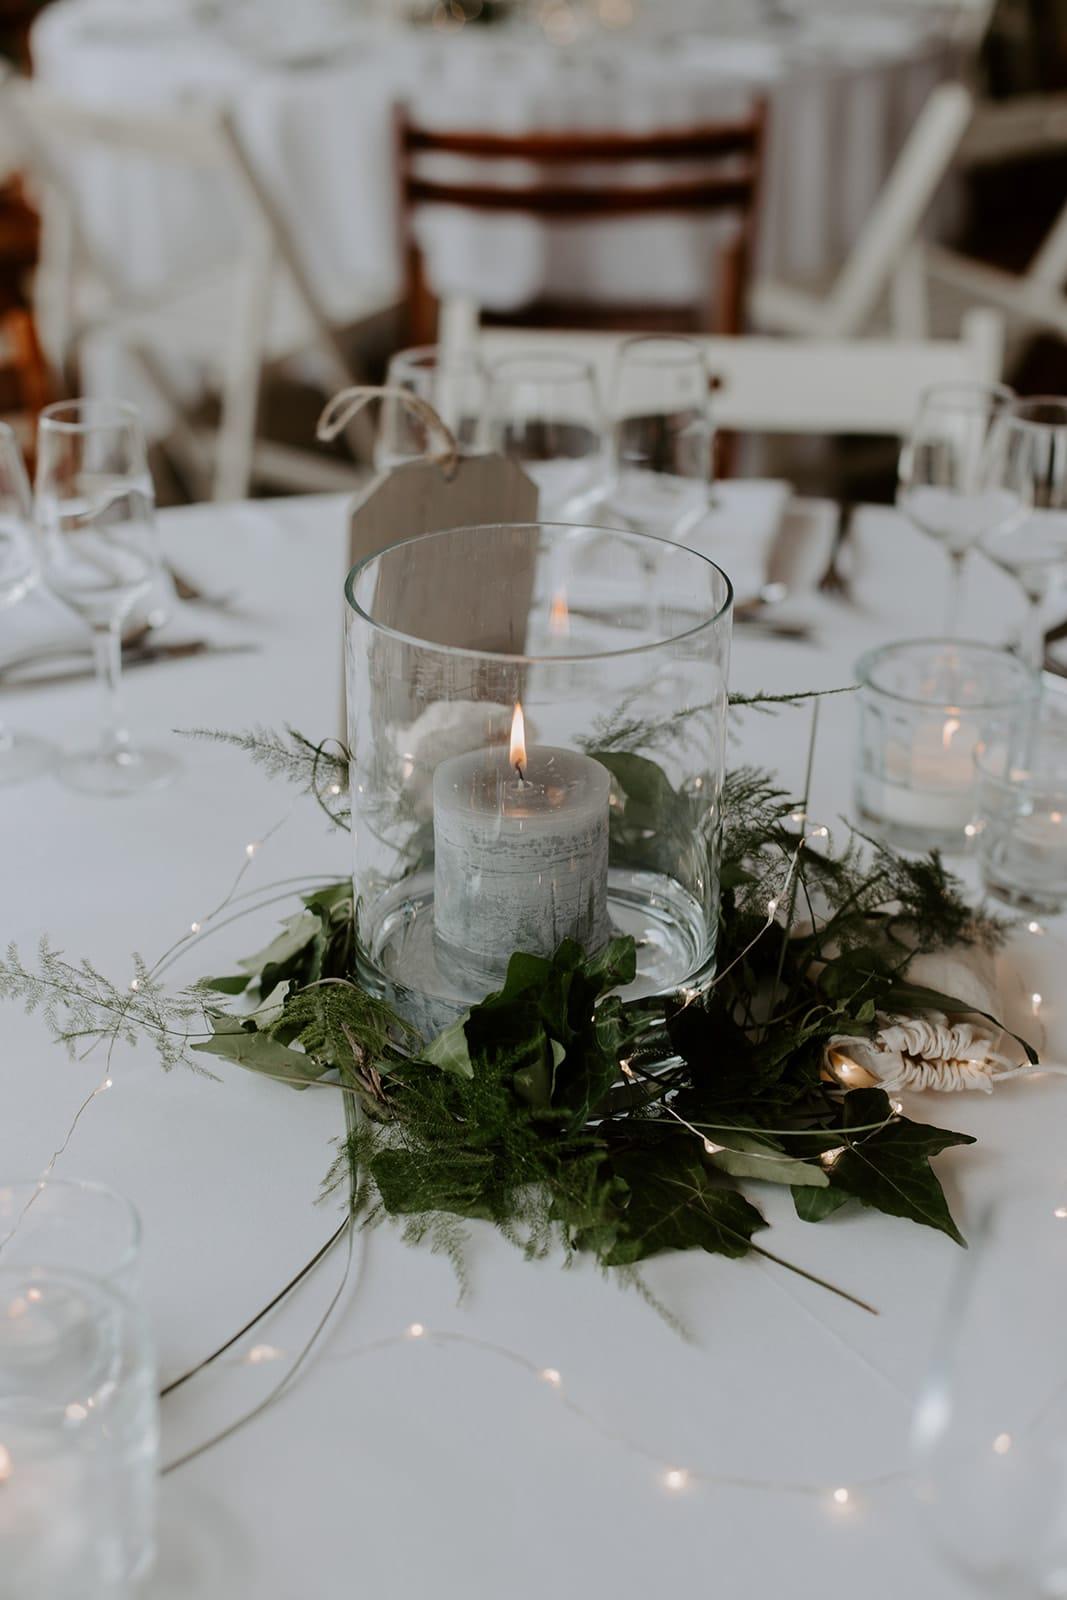 mariage_chateau_la_flocelliere_vendee_flavie_nelly_photographe-9-obonheurdesdames-decoration-mariage-location-vegetal